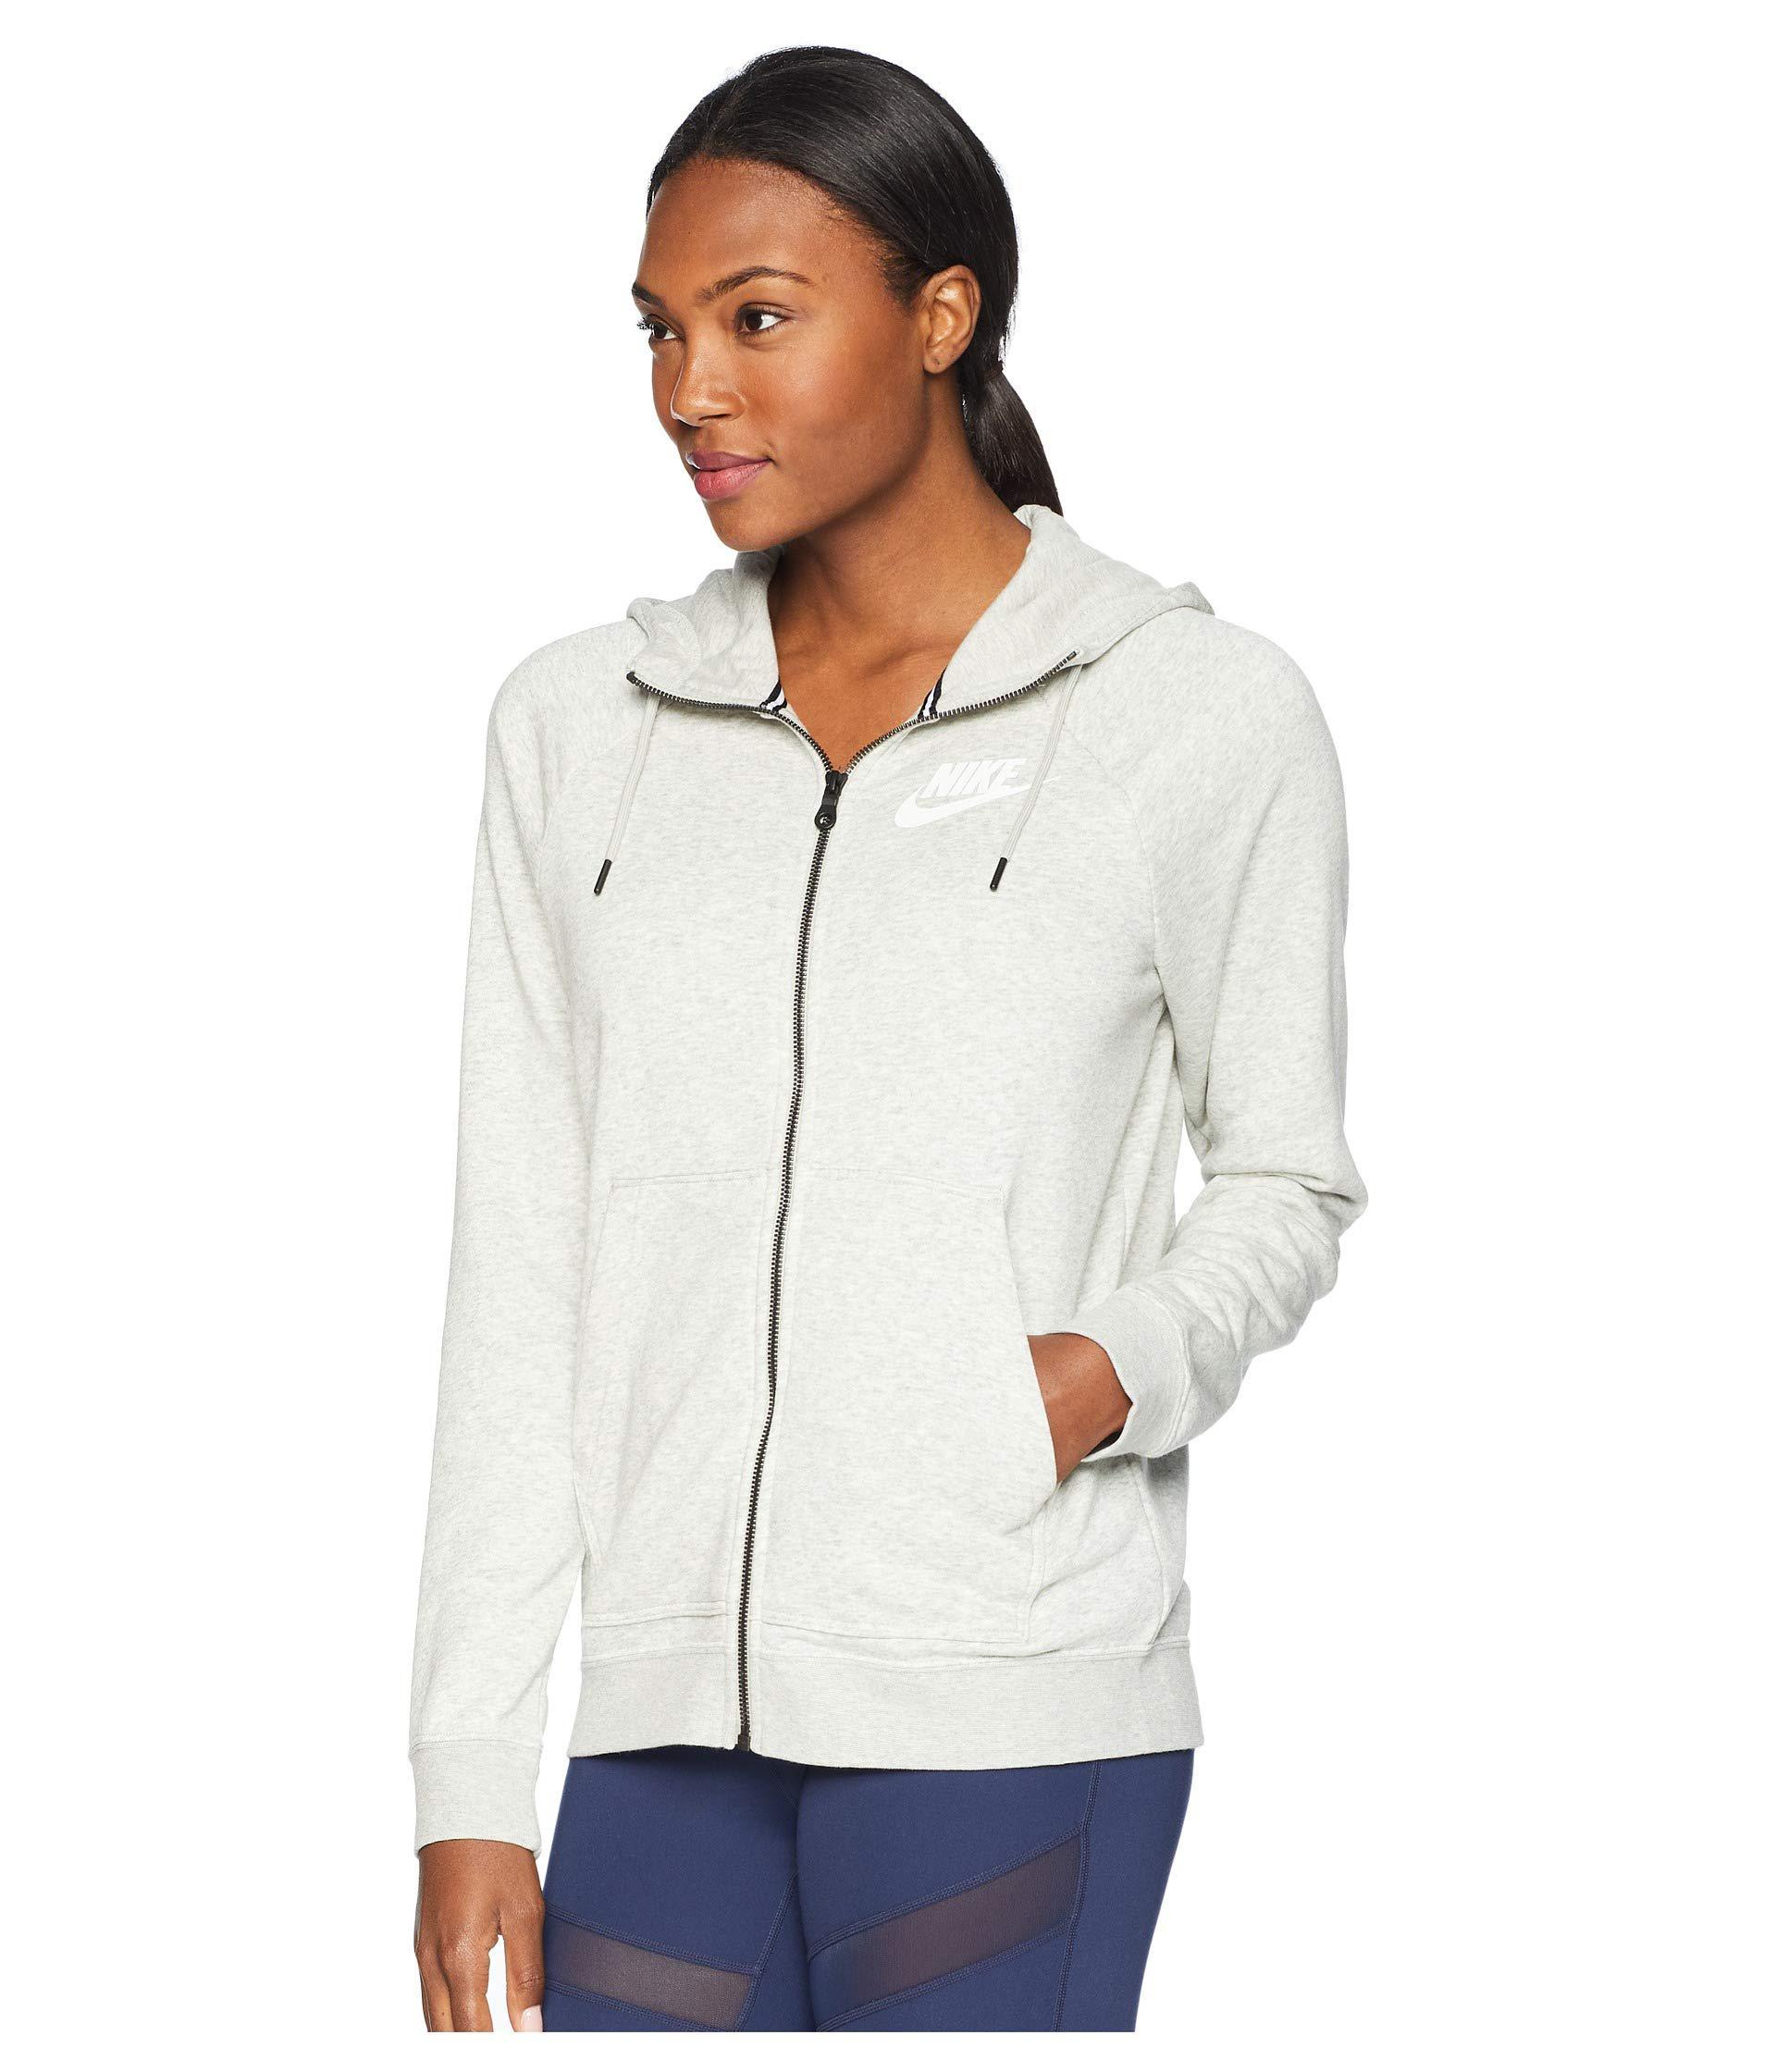 5f3a9262f999 Lyst - Nike Rally Hoodie Full Zip (black black white) Women s Sweatshirt in  Gray